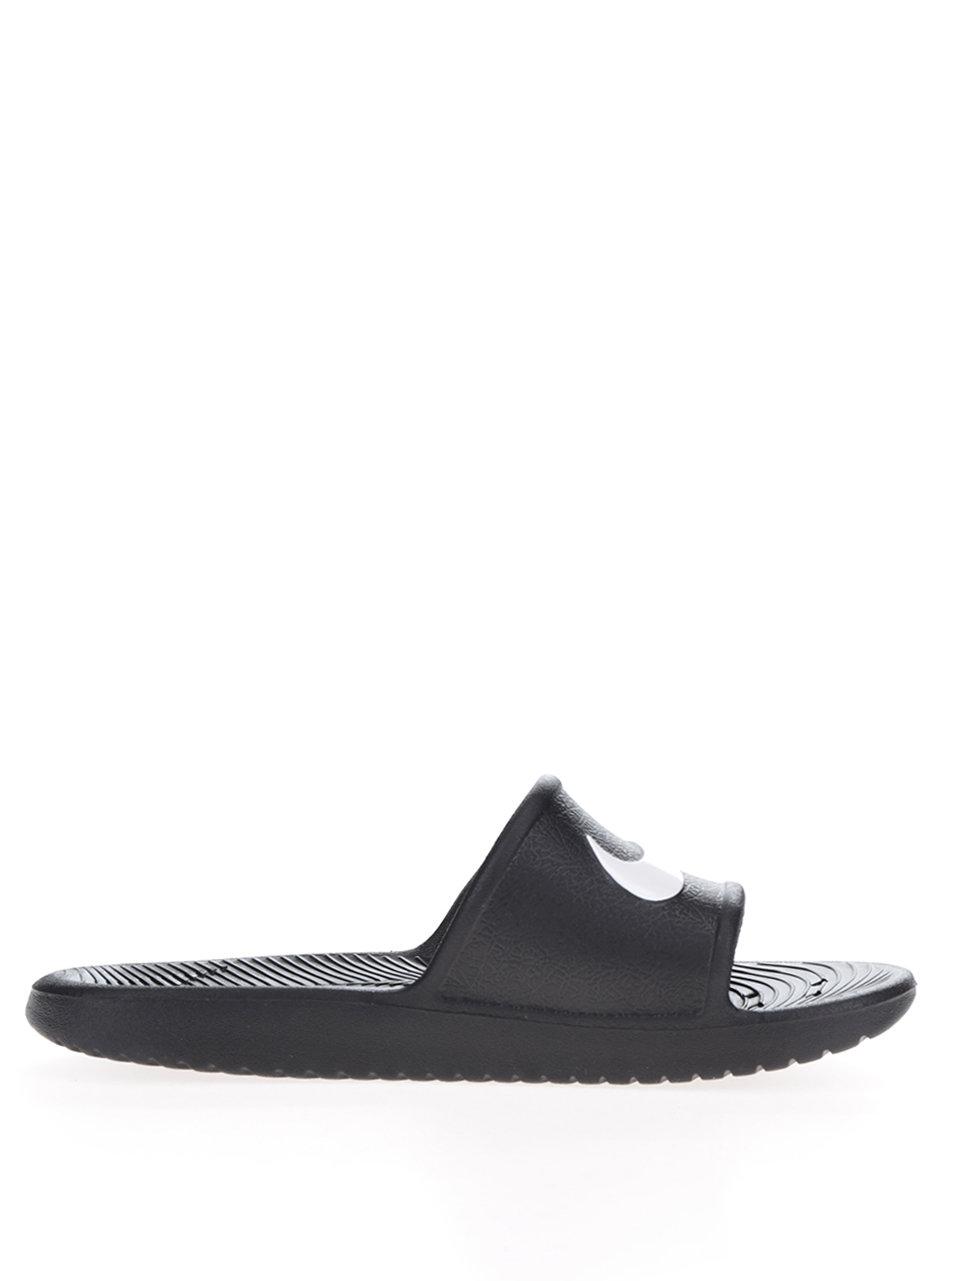 Čierne dámske šľapky Nike Kawa Shower ... e4b4fa842e2